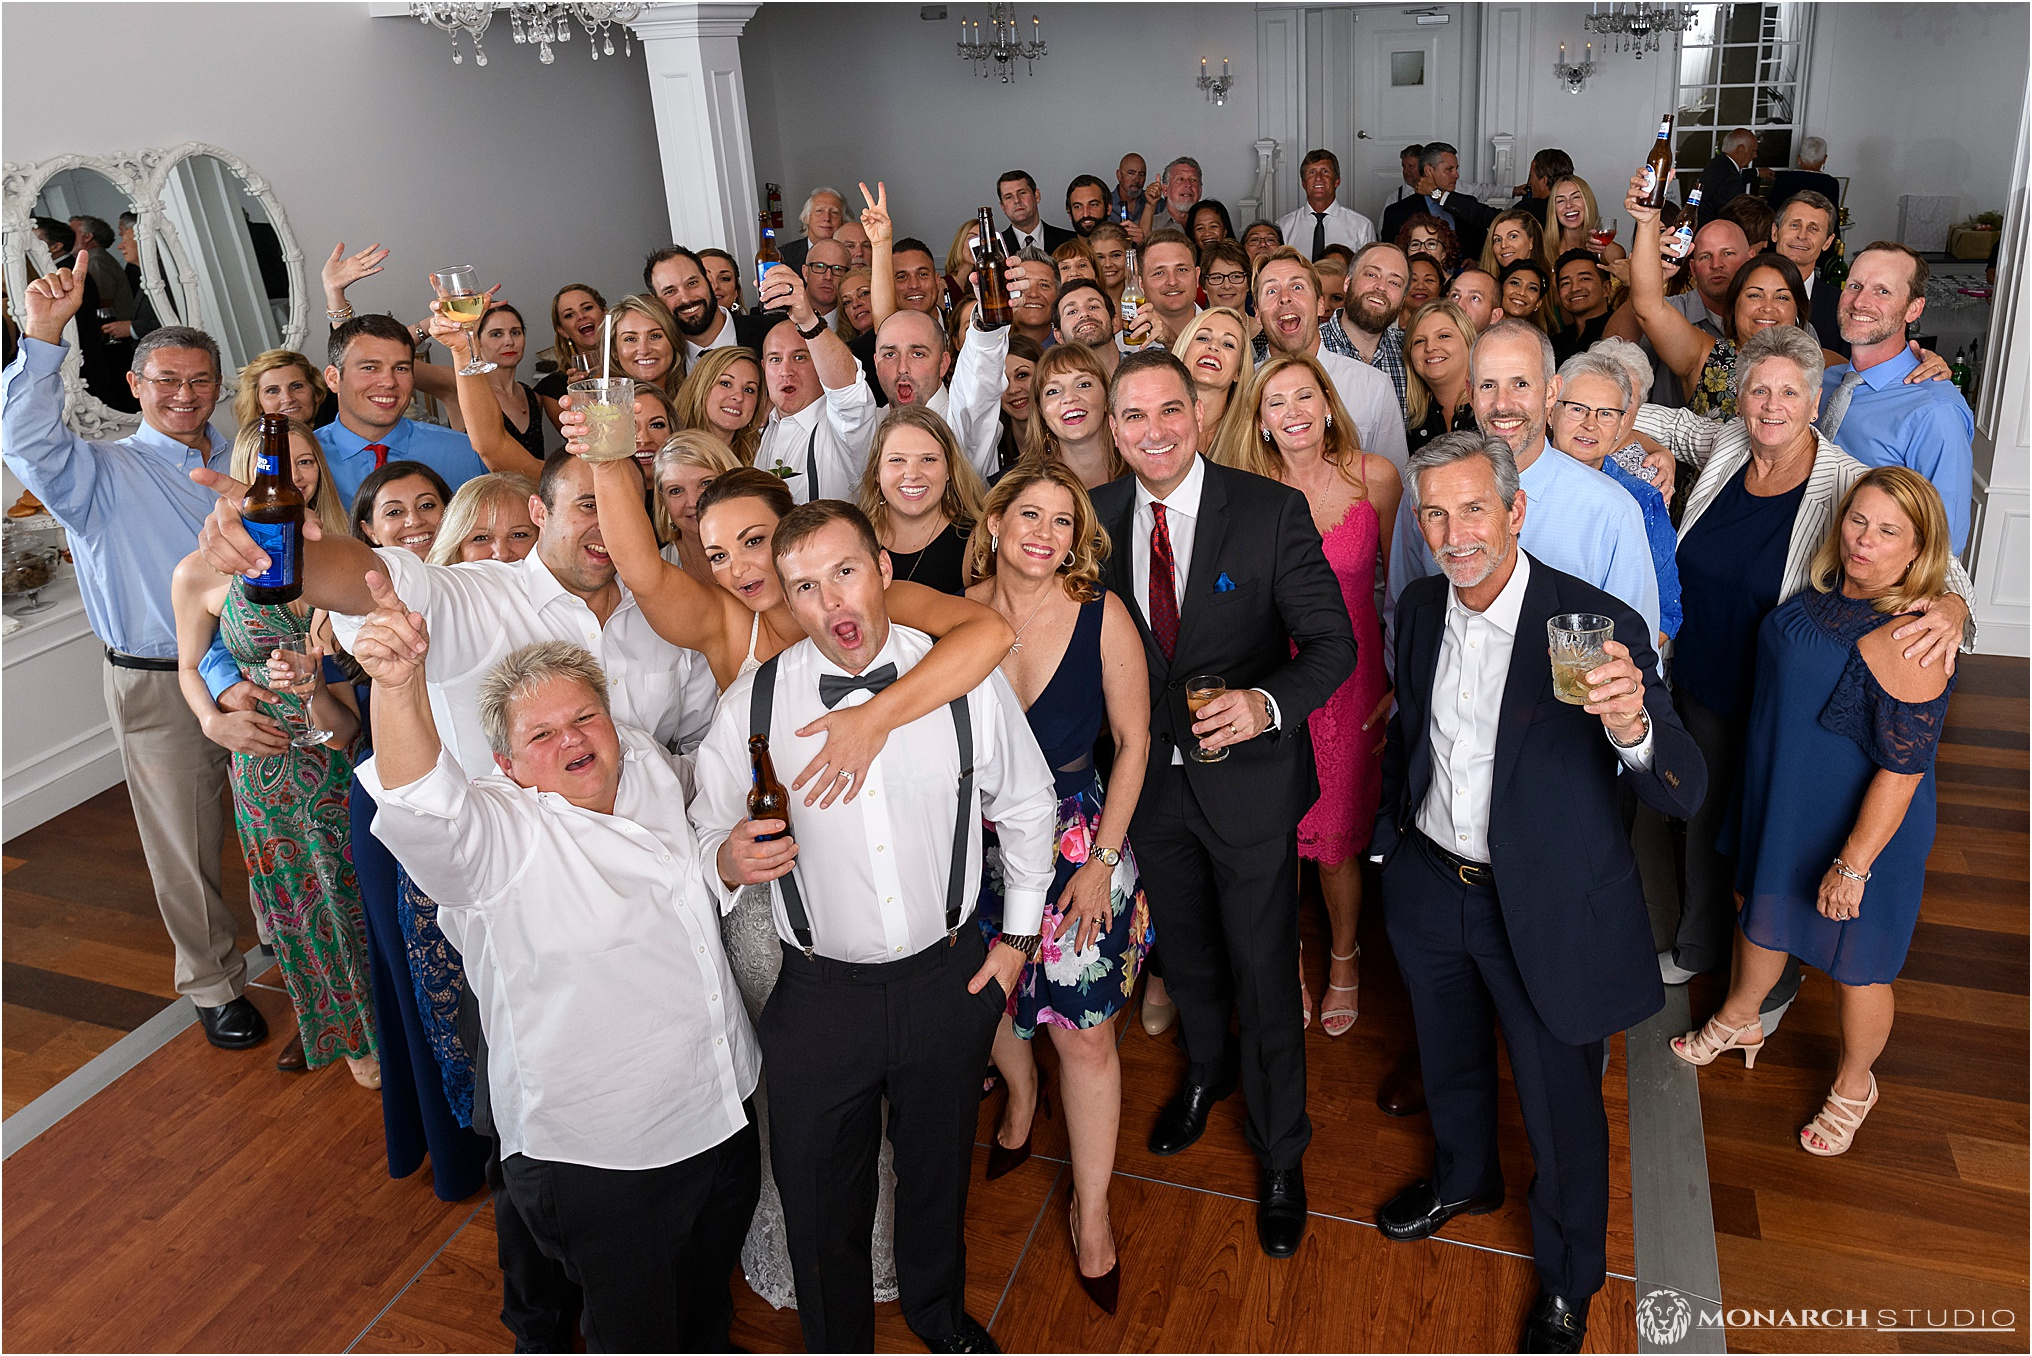 105-whiteroom-wedding-photographer-2019-05-22_0087.jpg